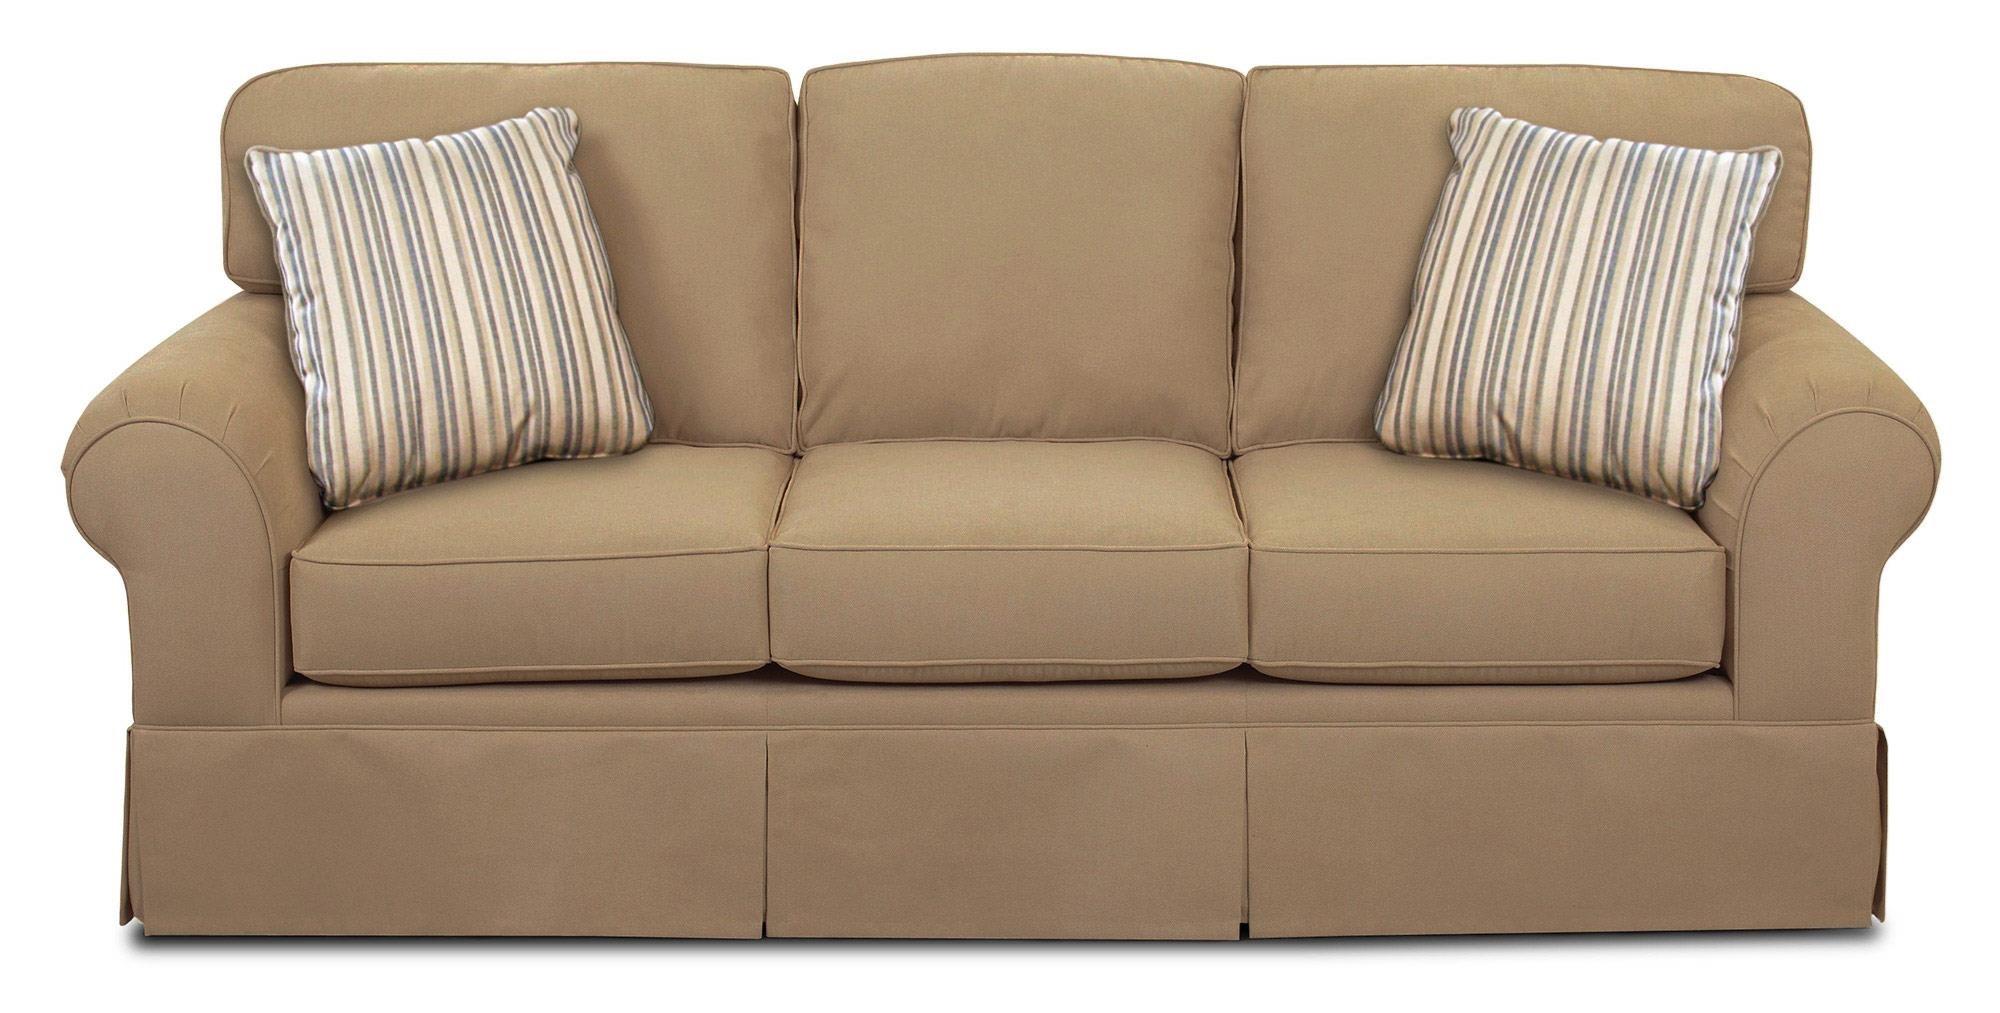 schnadig sofa 9090 bed 2 in 1 bestway various elegant and comfortable furniture for casual